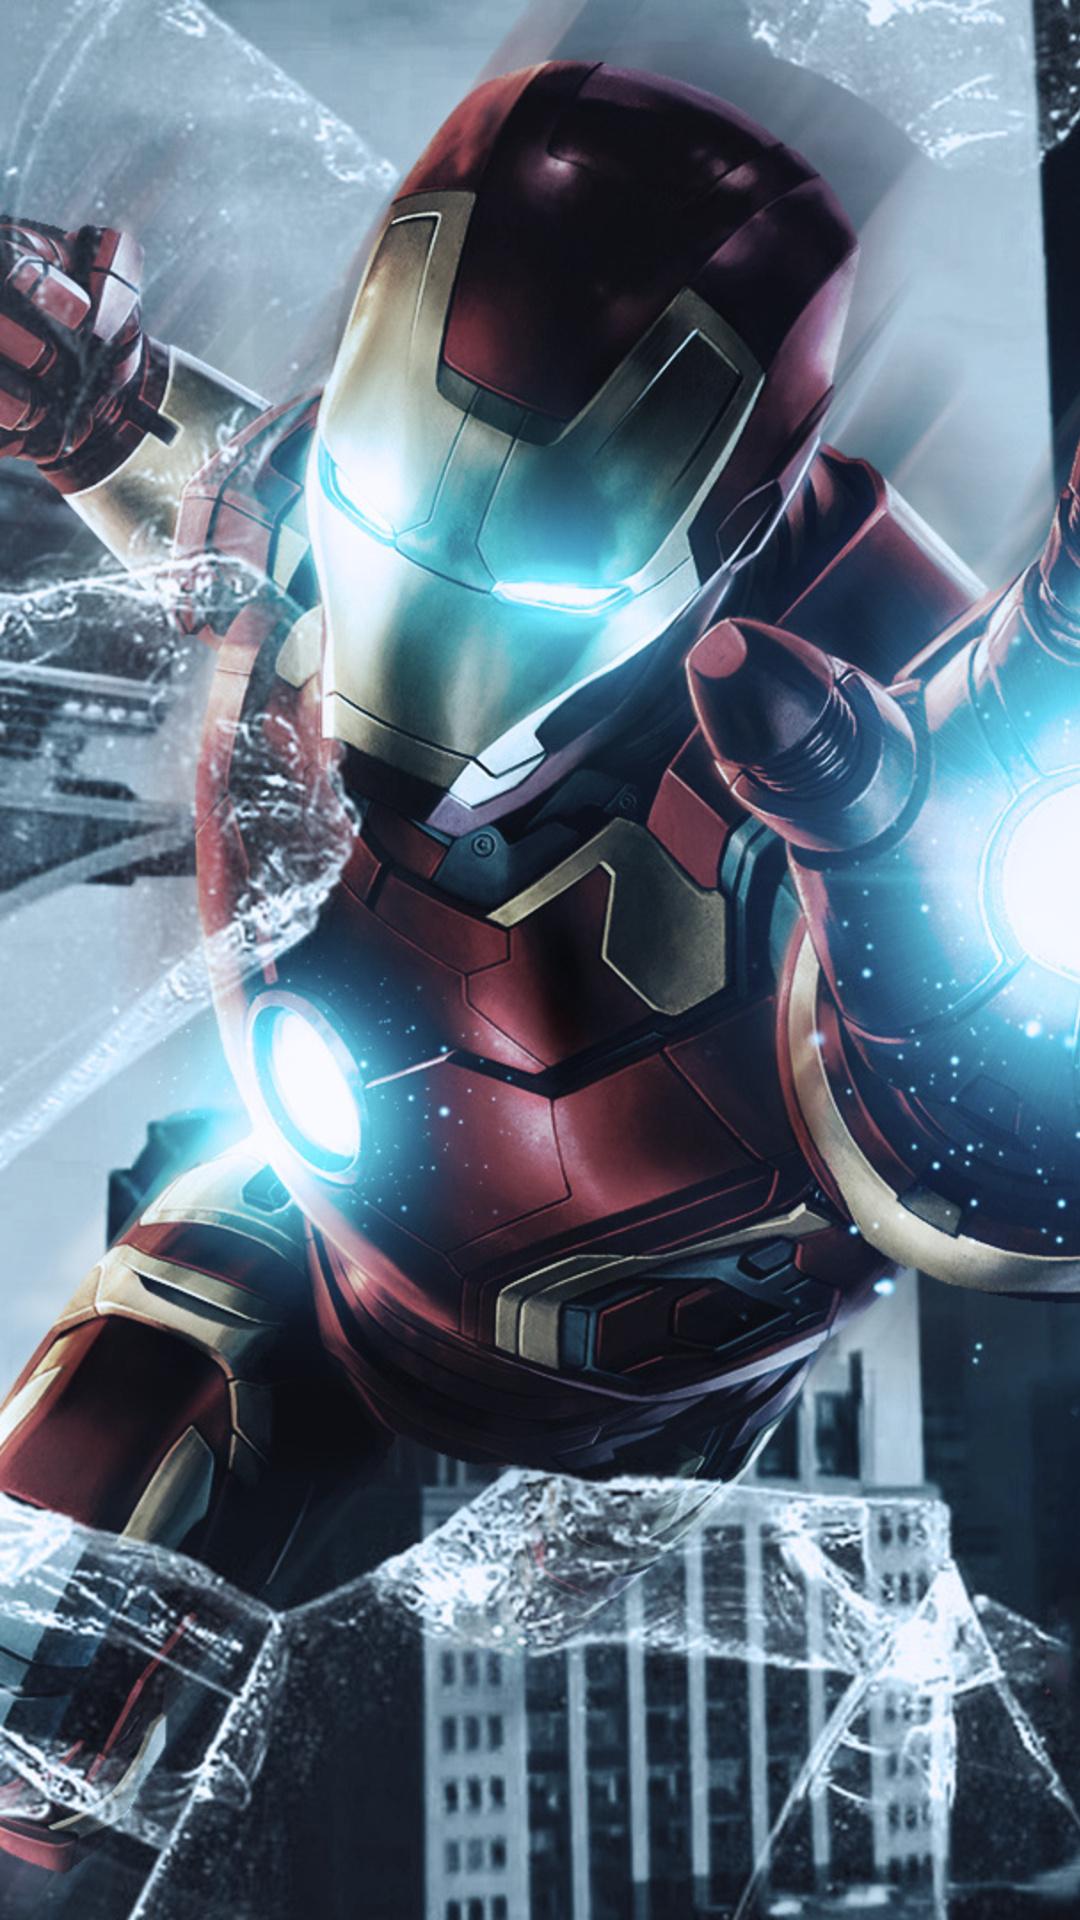 1080x1920 Iron Man Avengers Endgame Poster Iphone 7,6s,6 Plus, Pixel xl ,One Plus 3,3t,5 HD 4k